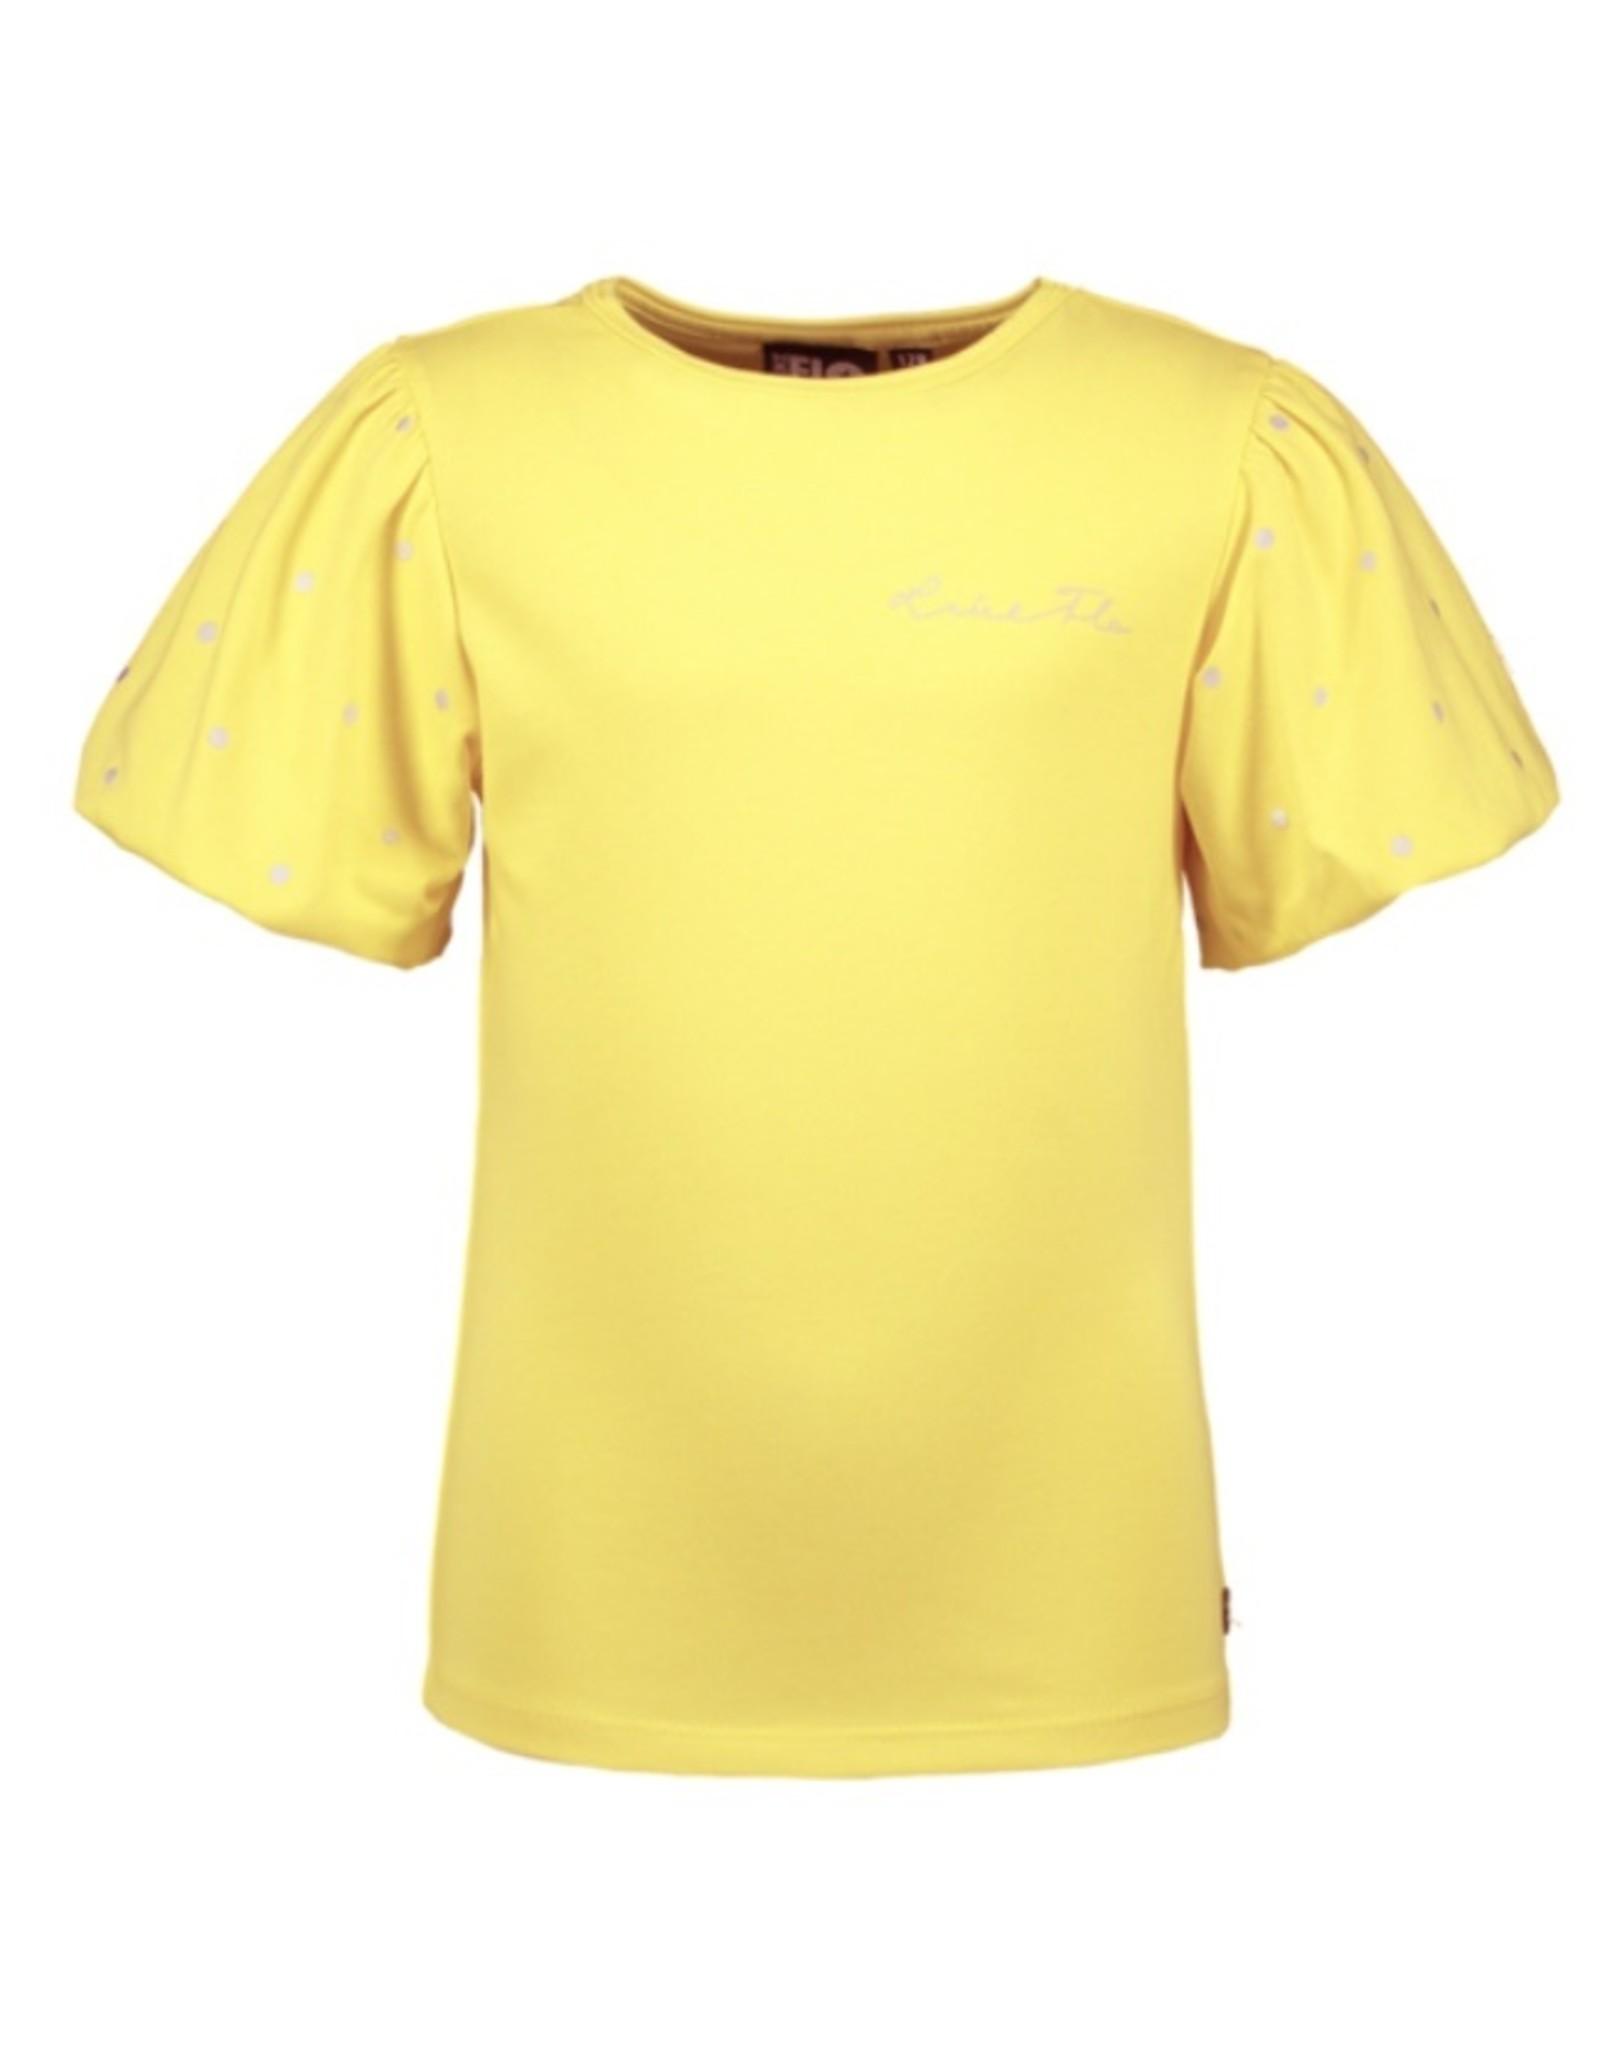 Flo F103-5460 T-Shirt